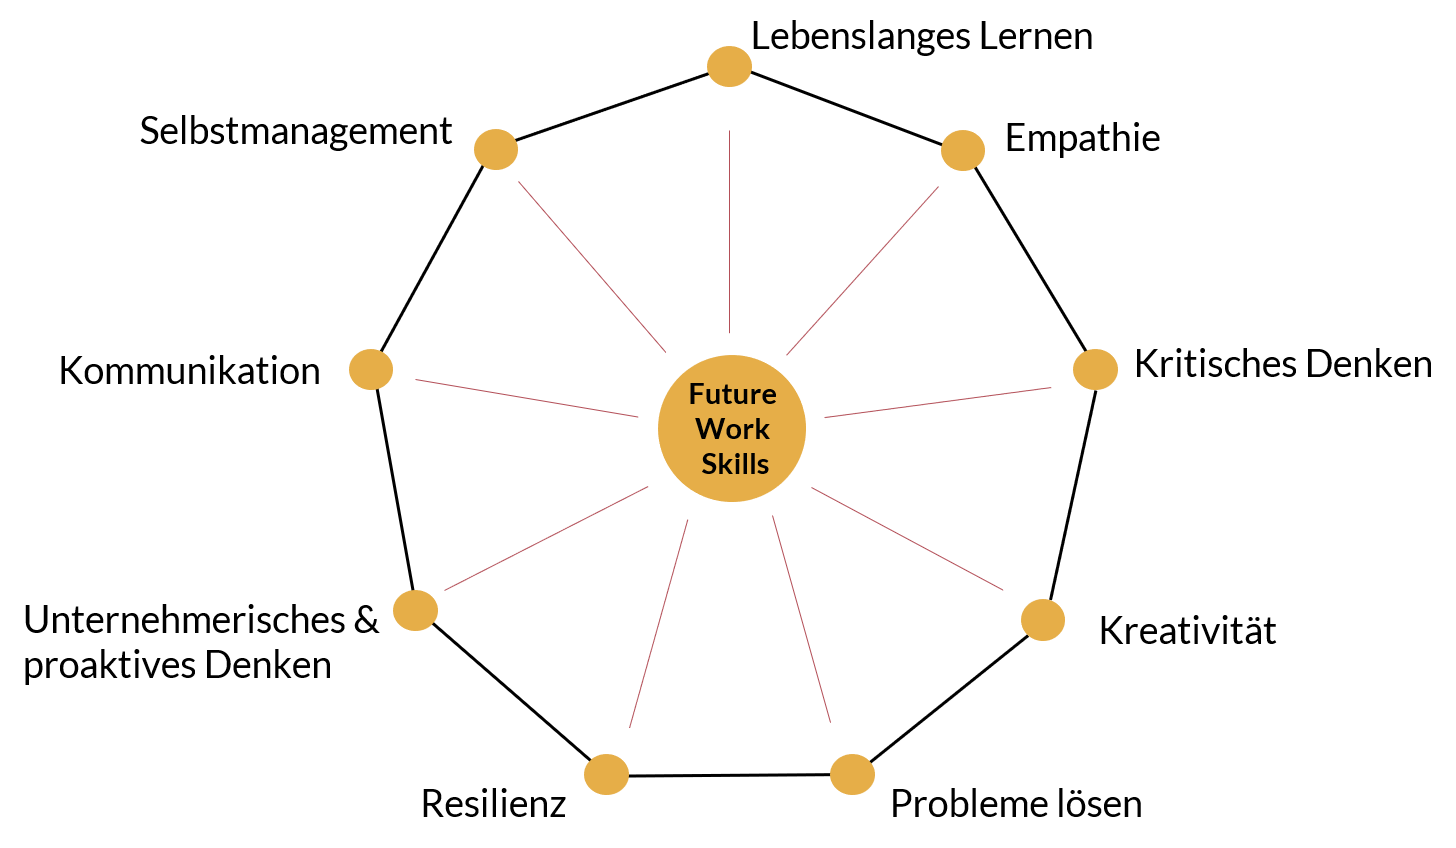 9 Future Work Skills